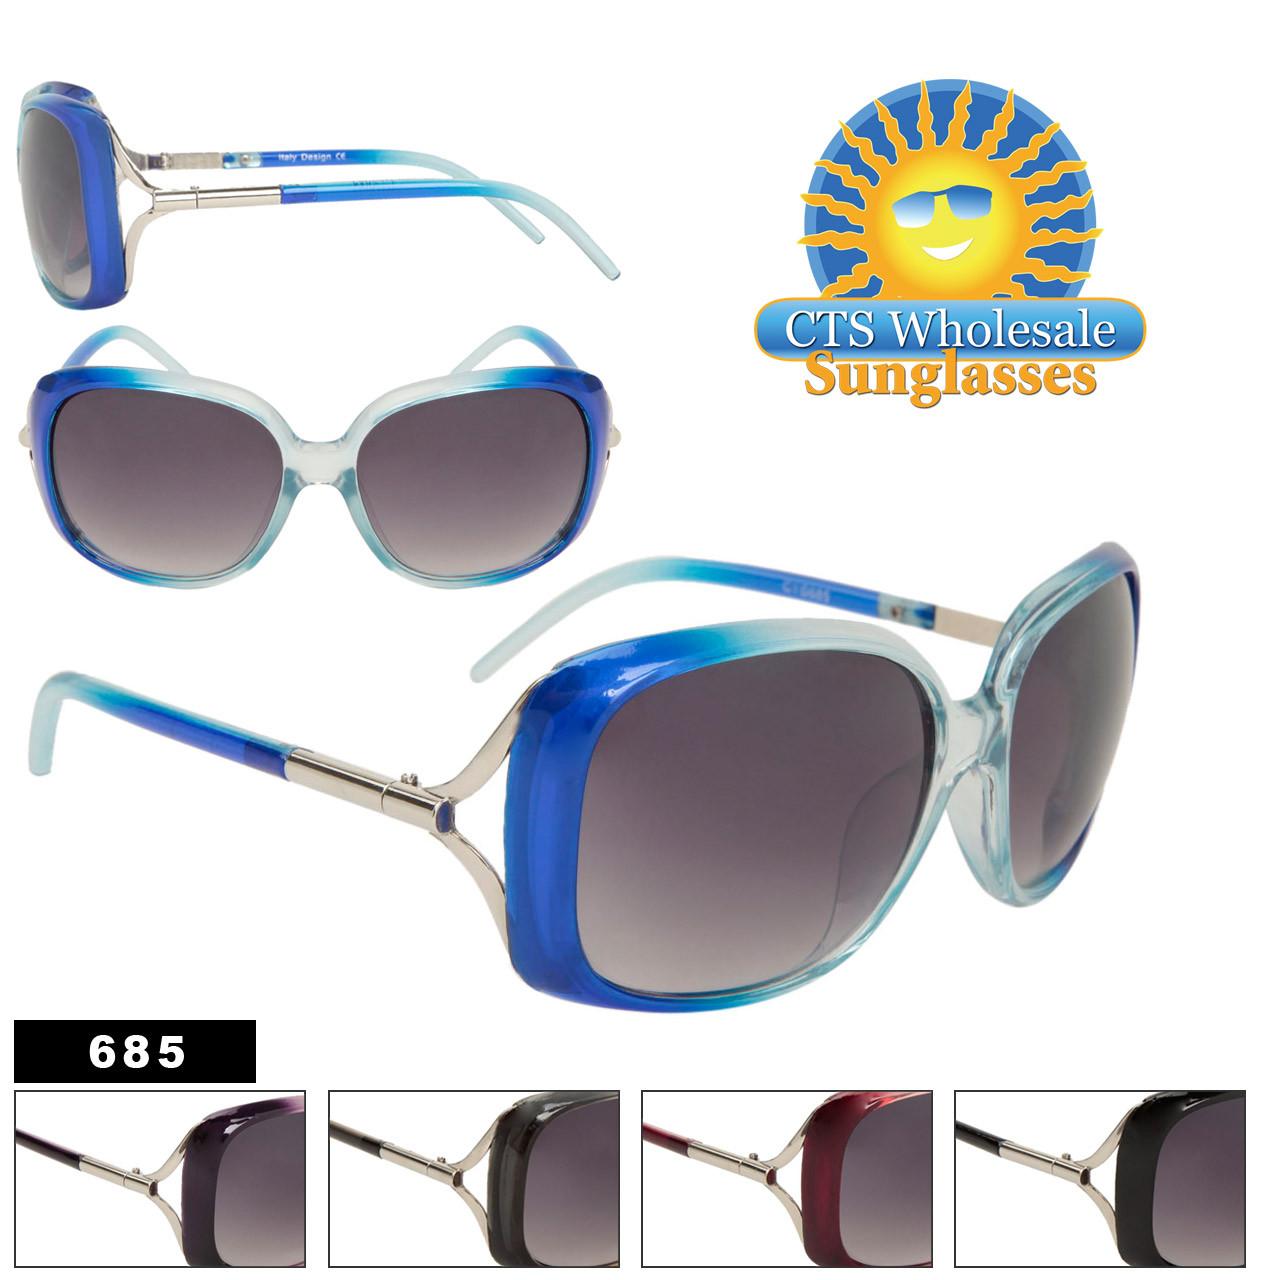 Stylish Sunglasses for Ladies 685